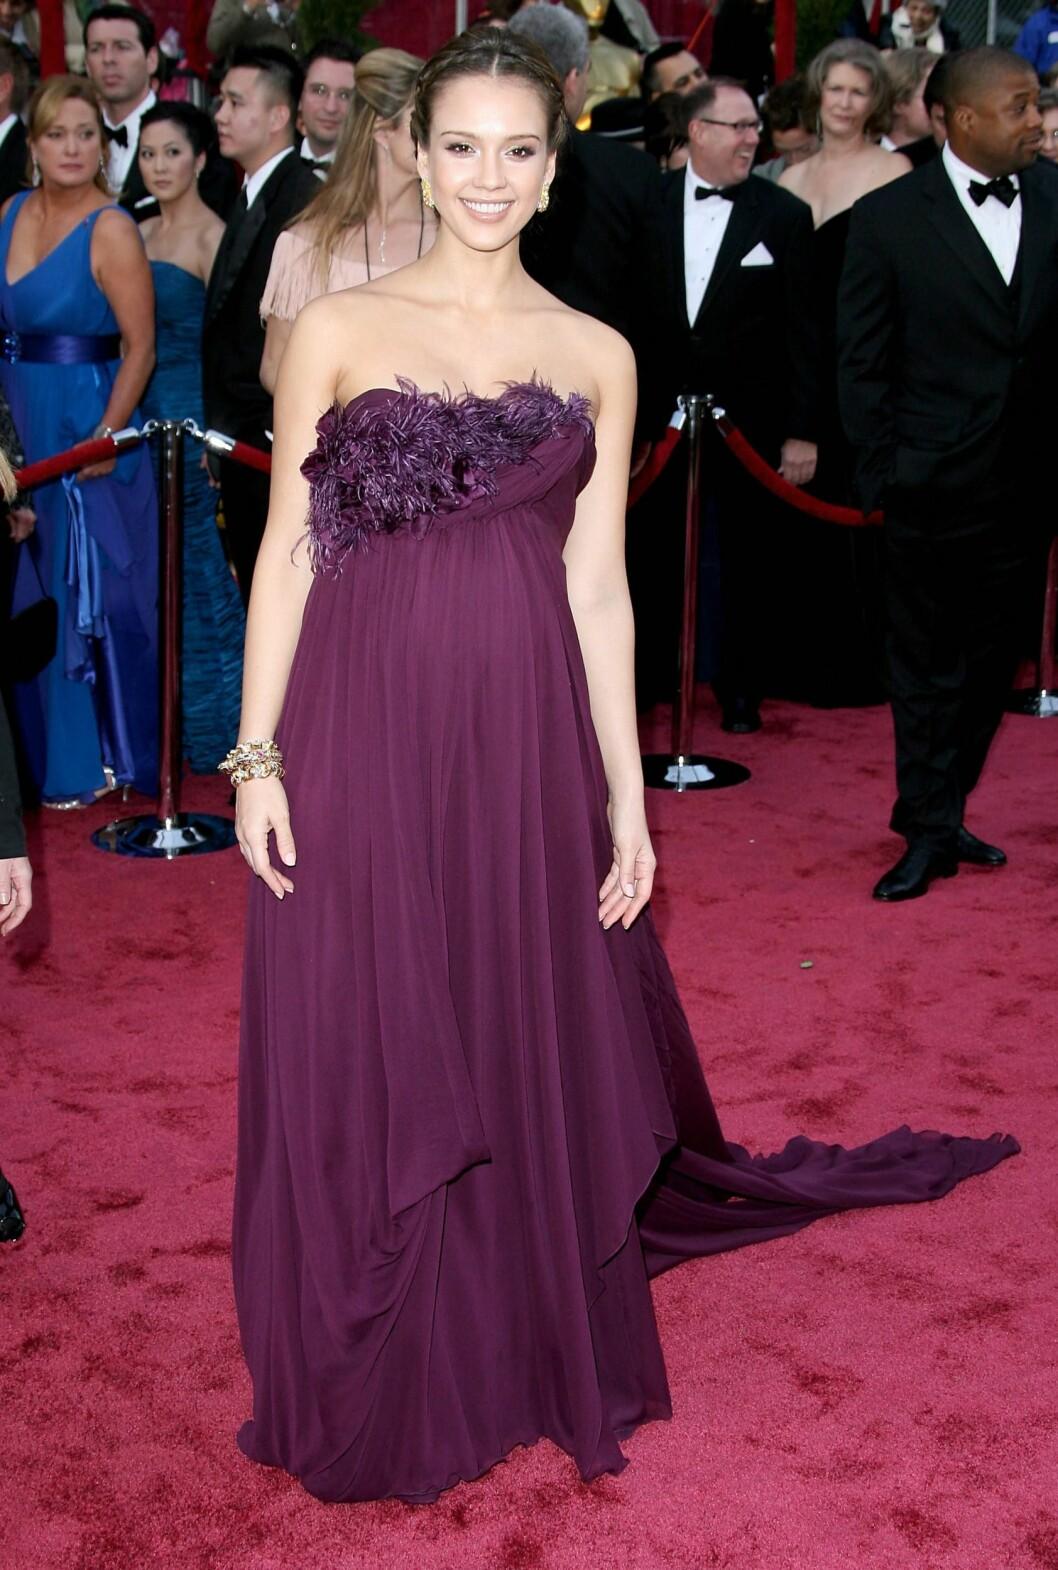 Jessica Alba var både vakker og gravid på den røde løperen. Foto: All Over Press